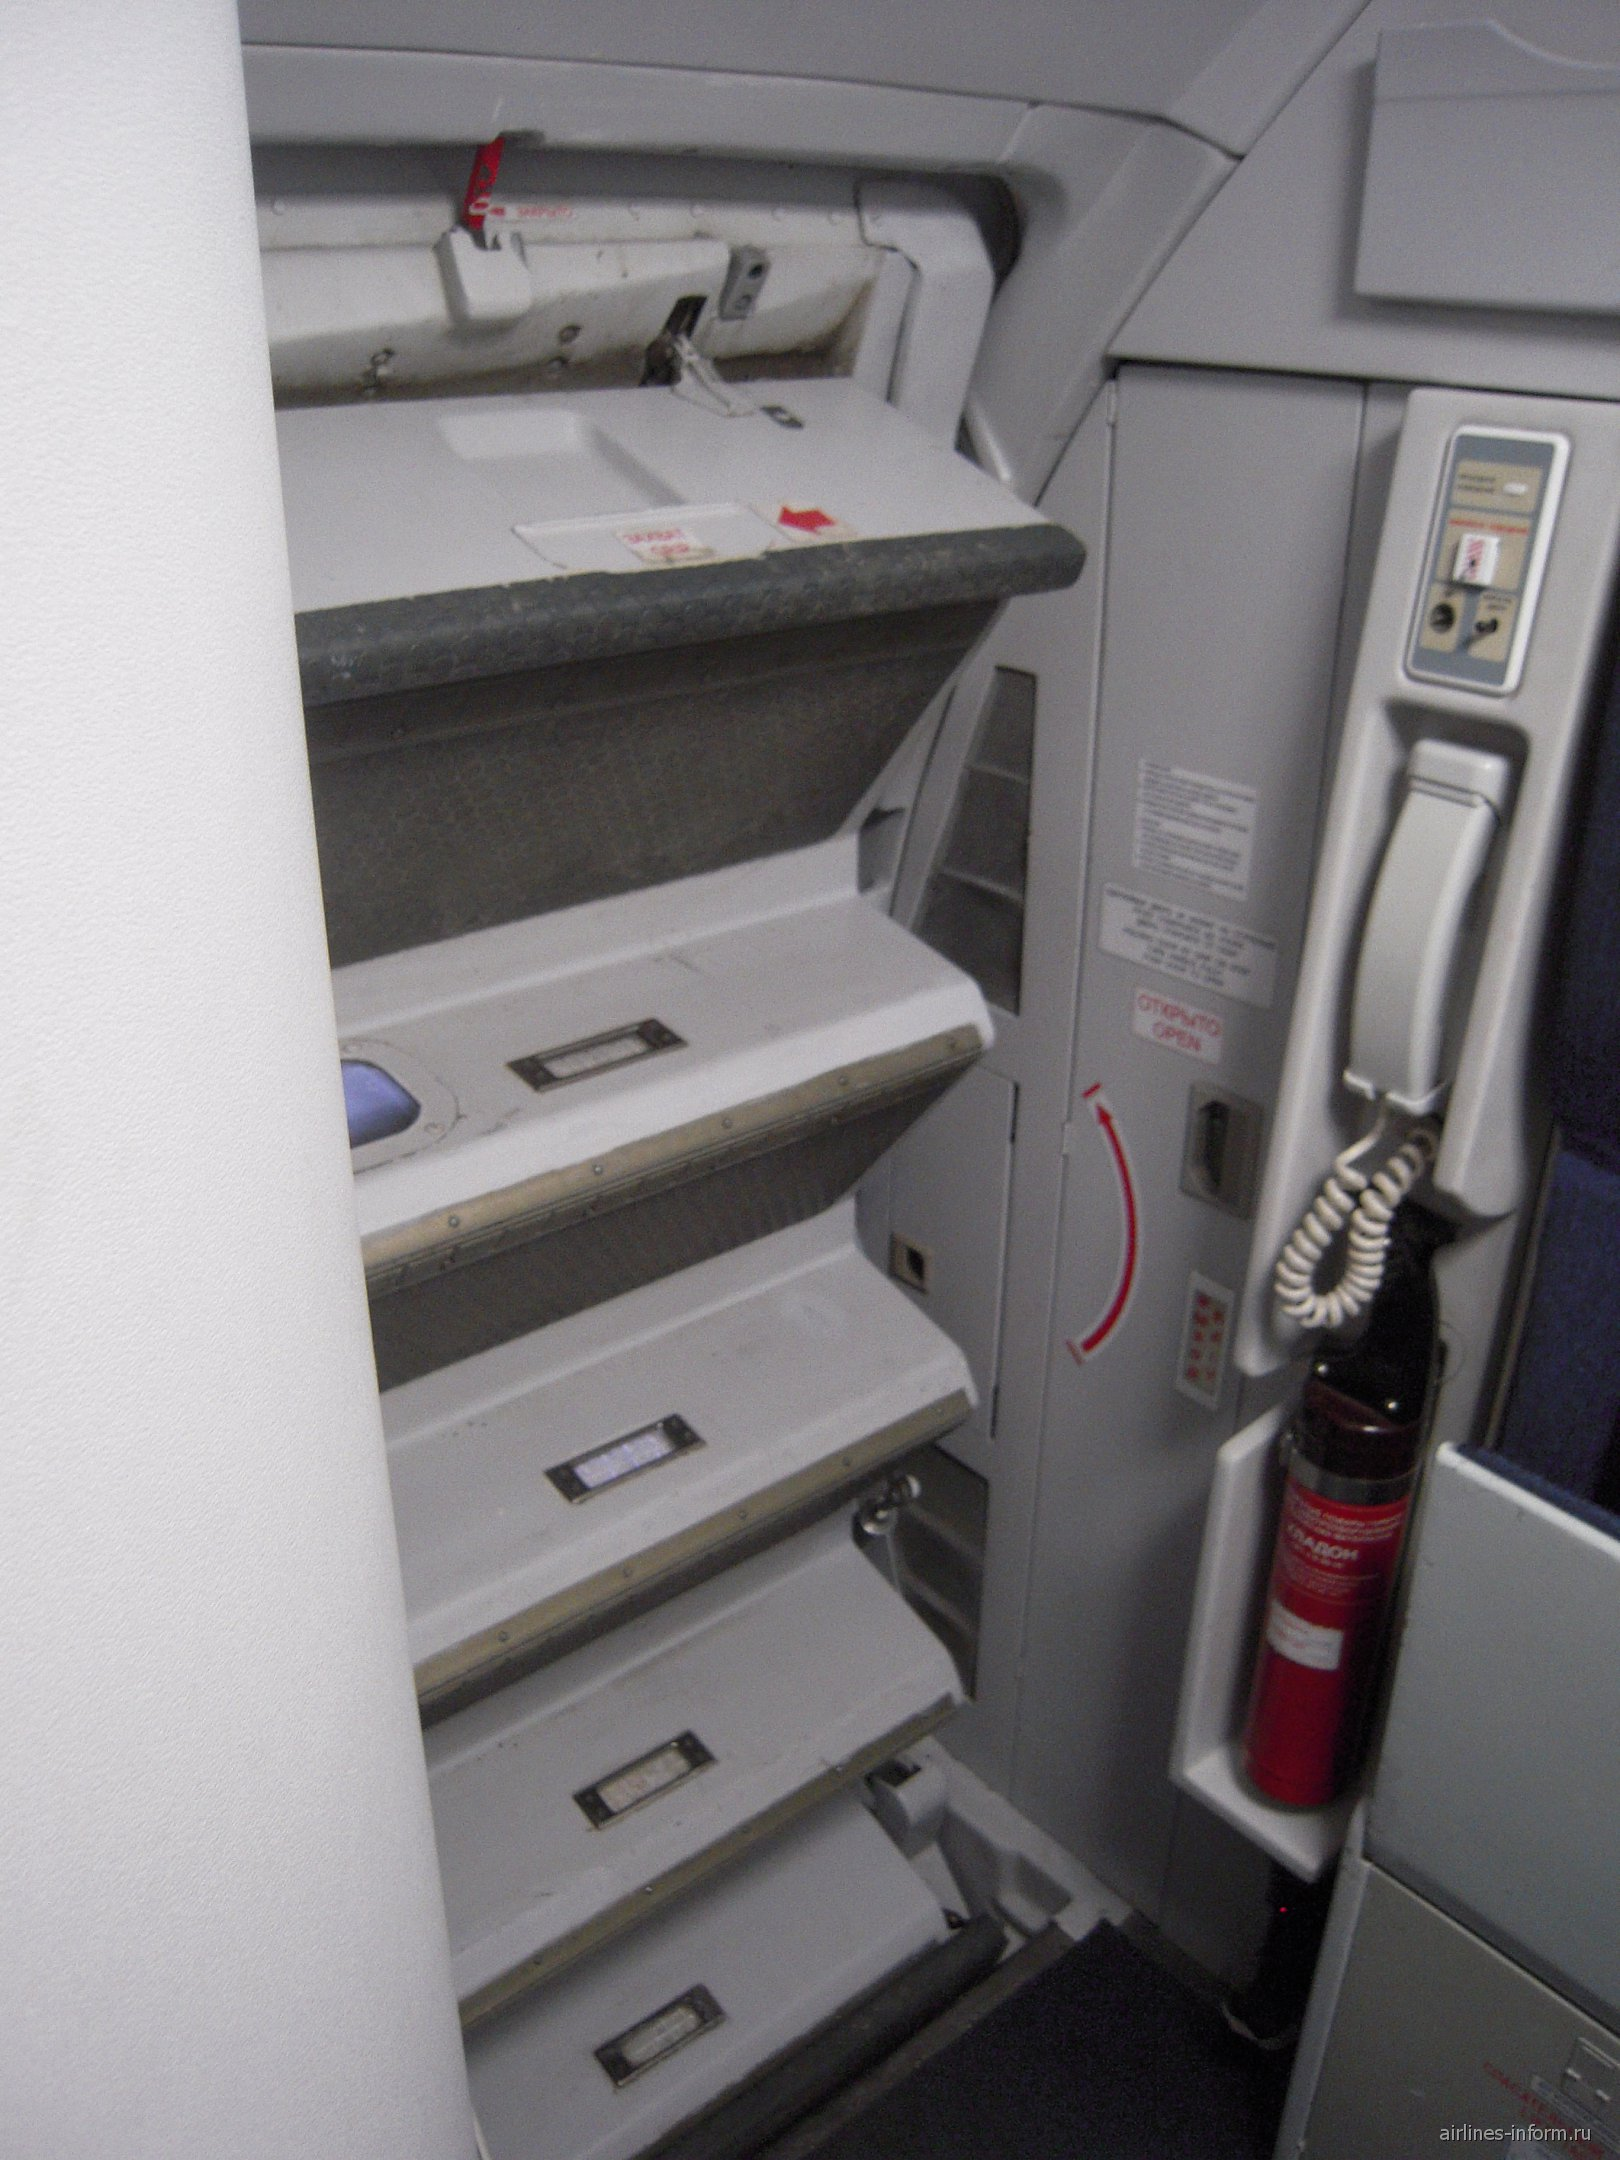 Трап самолета Ан-148 авиакомпании Россия